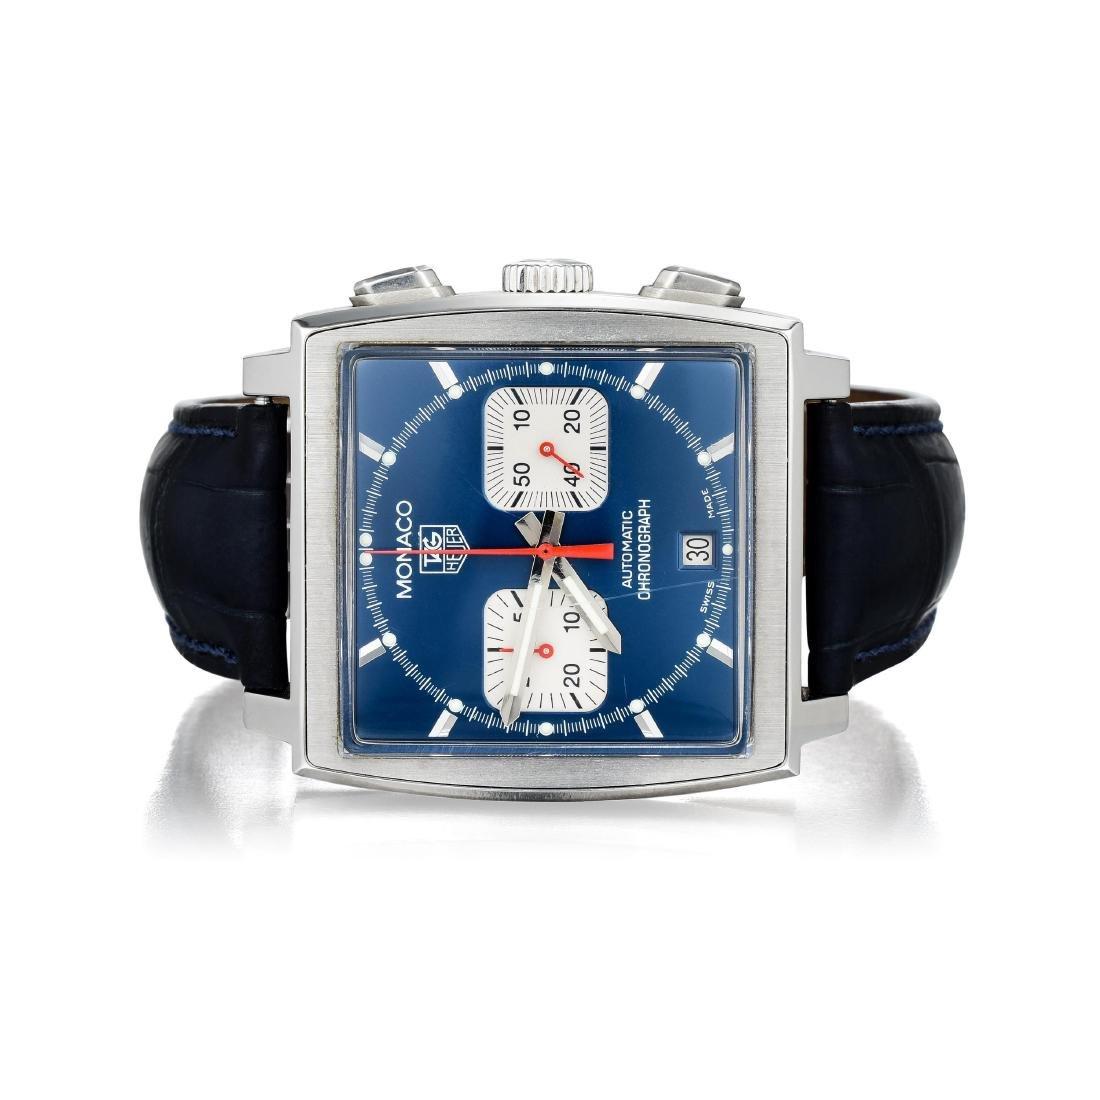 Tag Heuer Monaco Gents Chronograph Timepiece